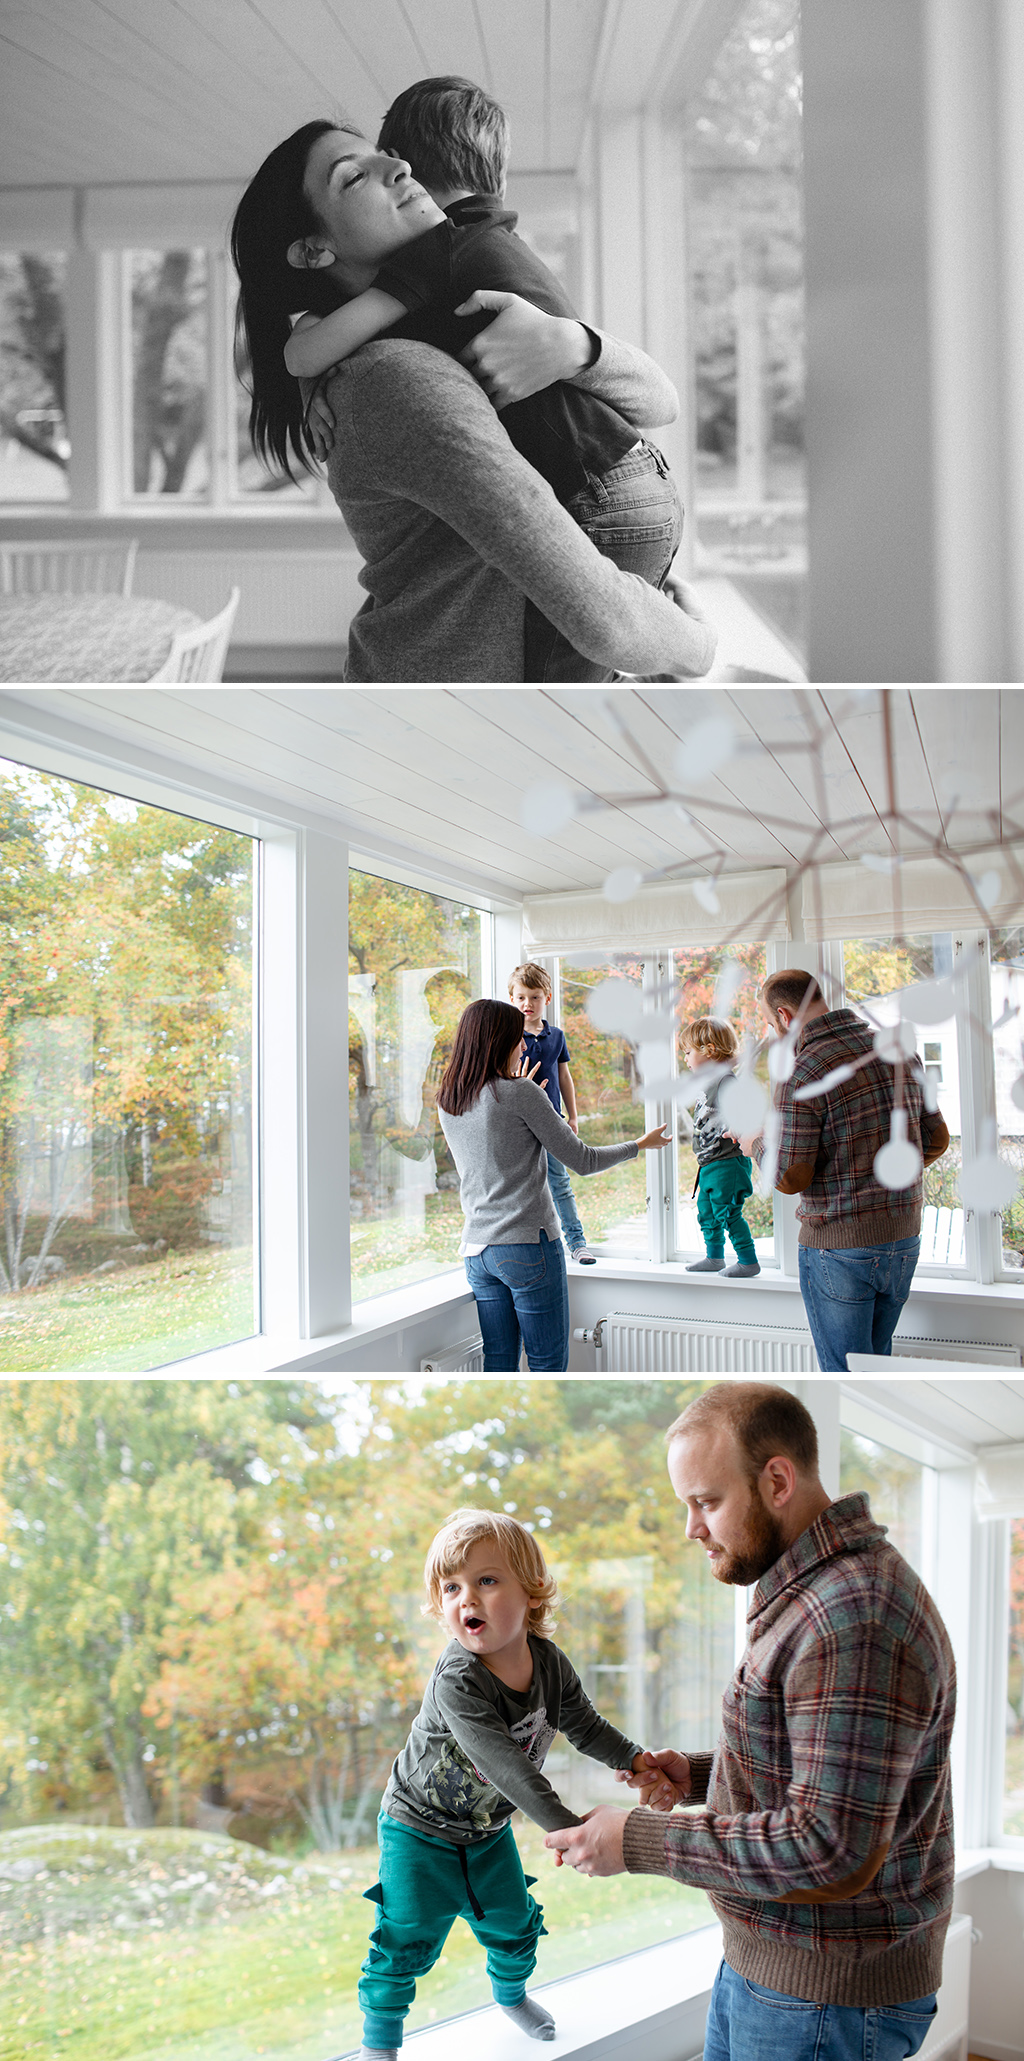 Hostfotografering_Lifestyle_hemma-hos-fotografering_Familjefotograf_Stockholm_18.jpg